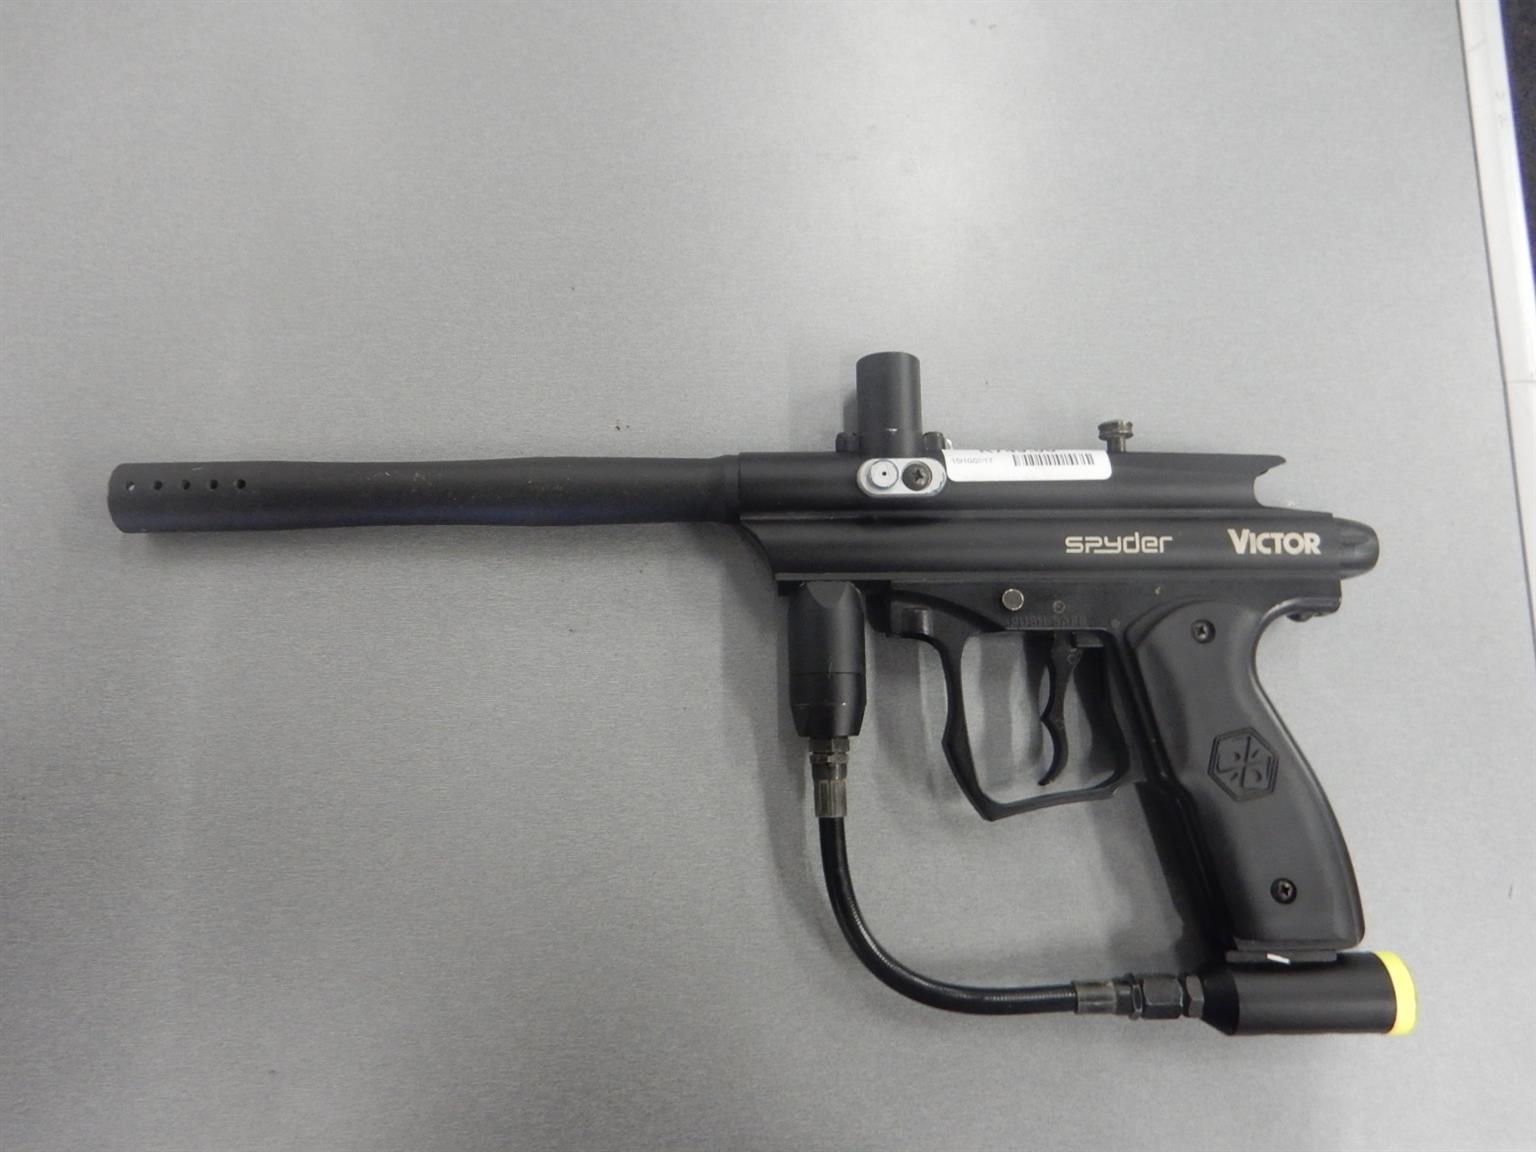 Spyder Victor Paintball Gun